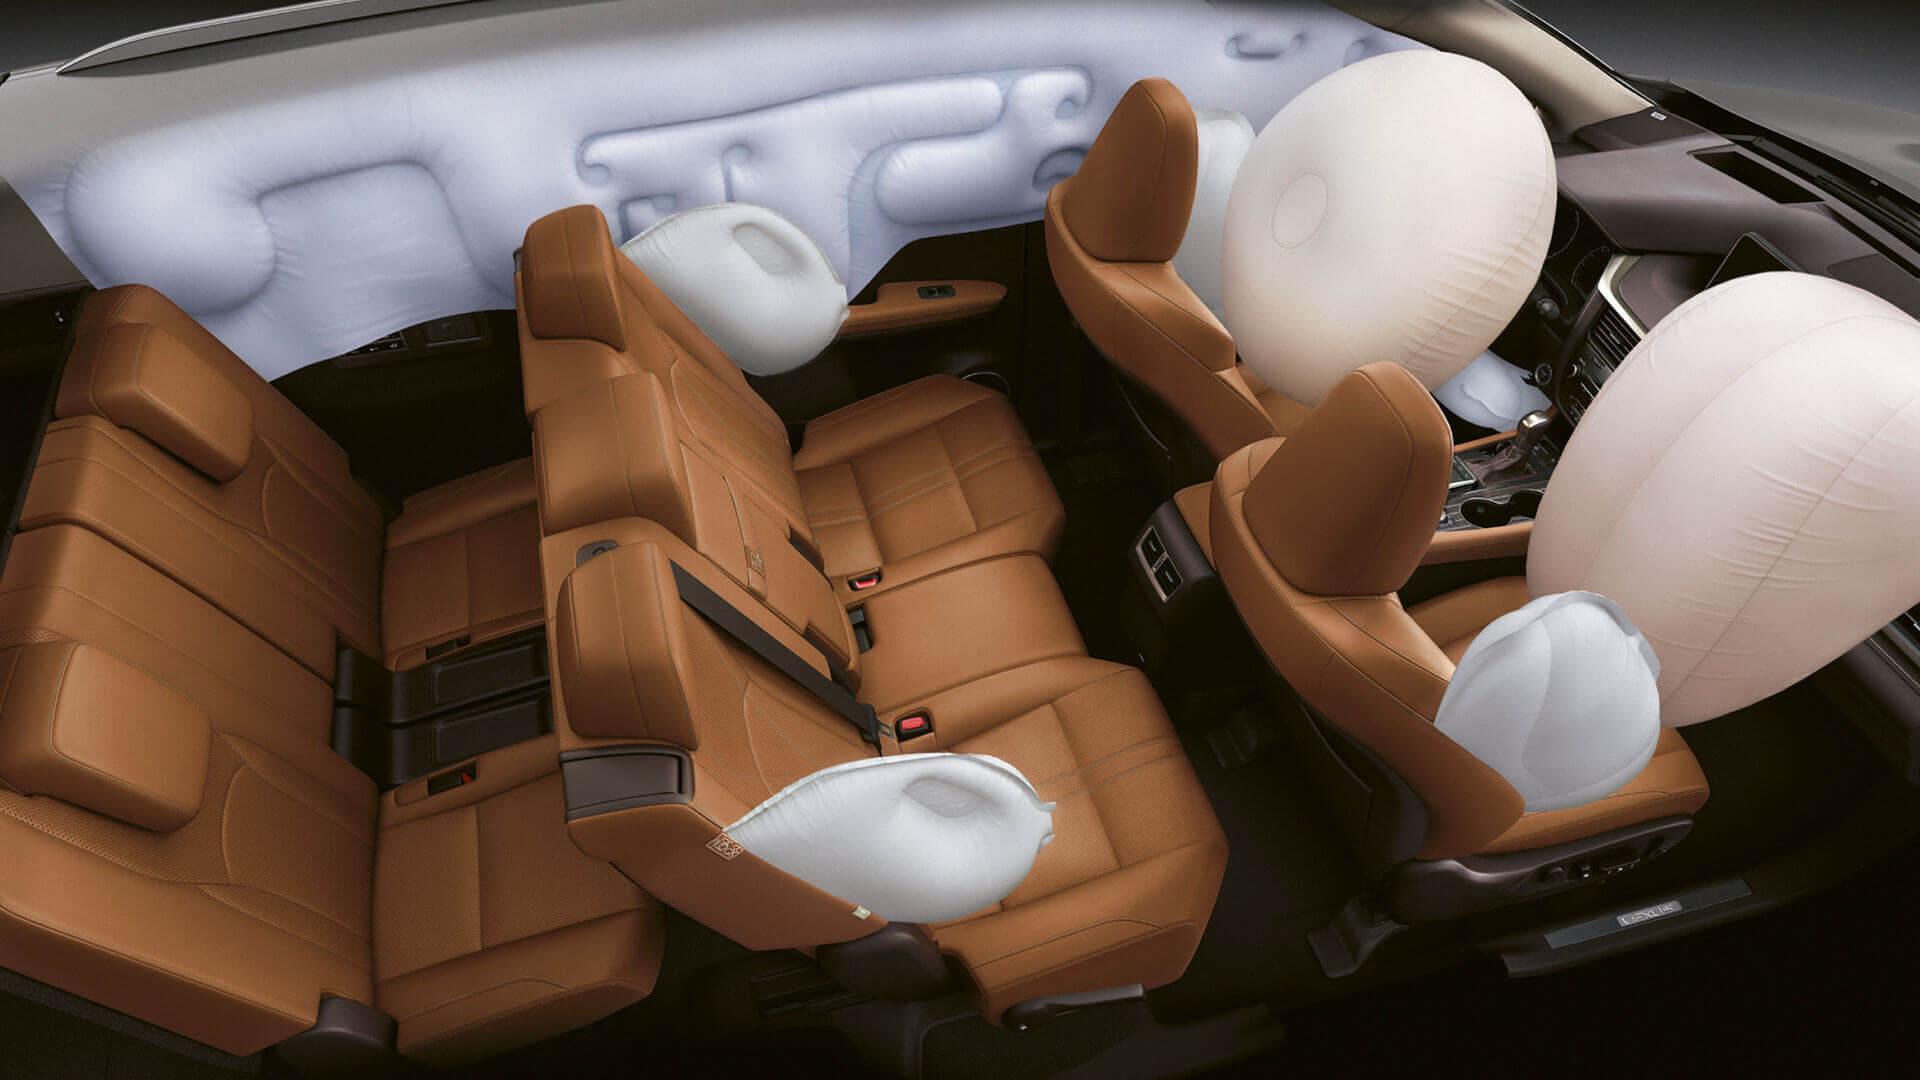 2019 lexus rxl hotspot third row airbags